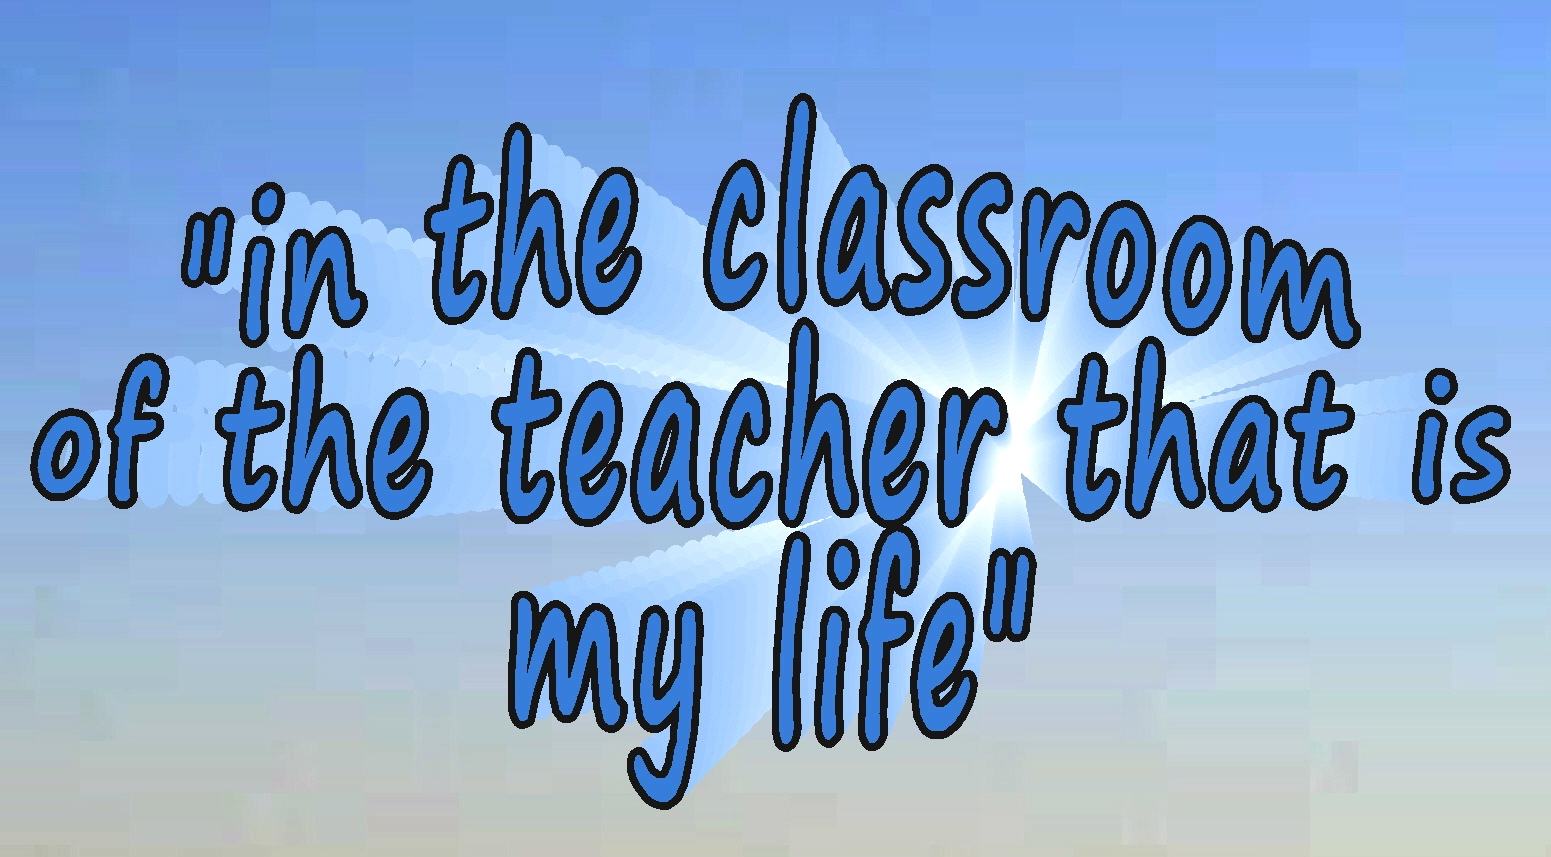 classroom-of-the-teacher-teacher-that-is-my-life